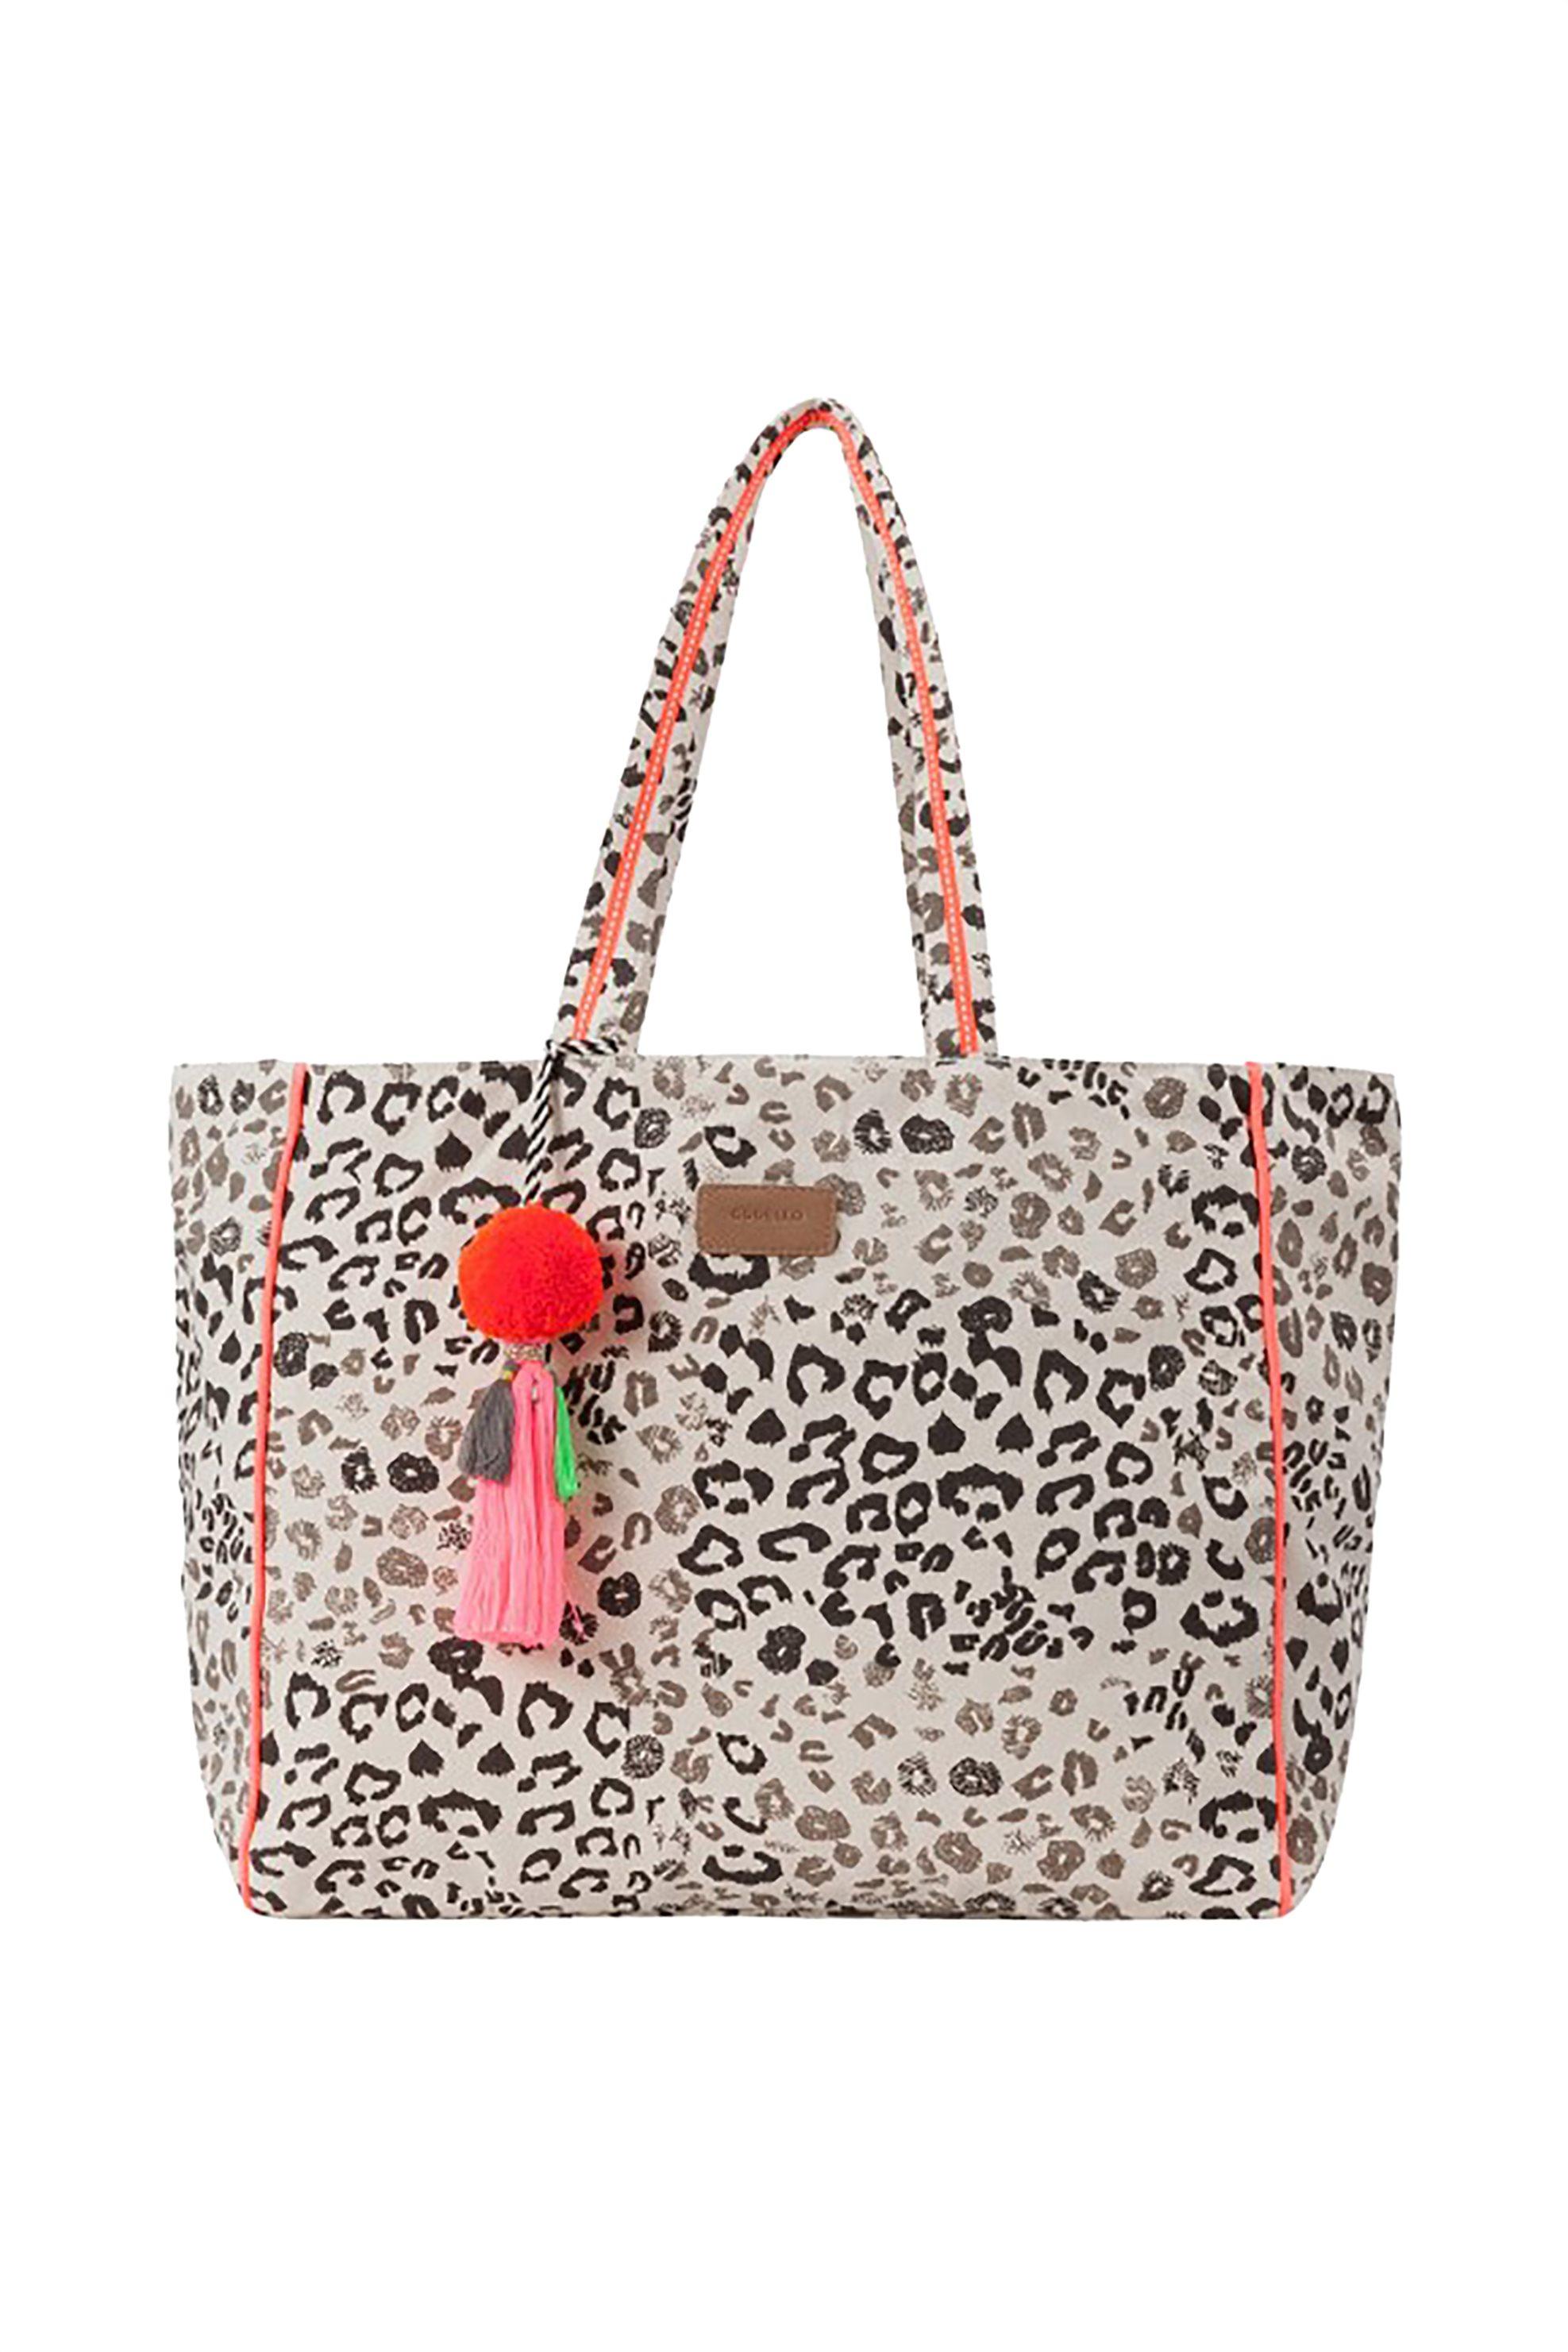 Codello γυναικεία τσάντα shopper με animal print - 4043072802468 γυναικα   τσαντεσ   ώμου   shopper bags